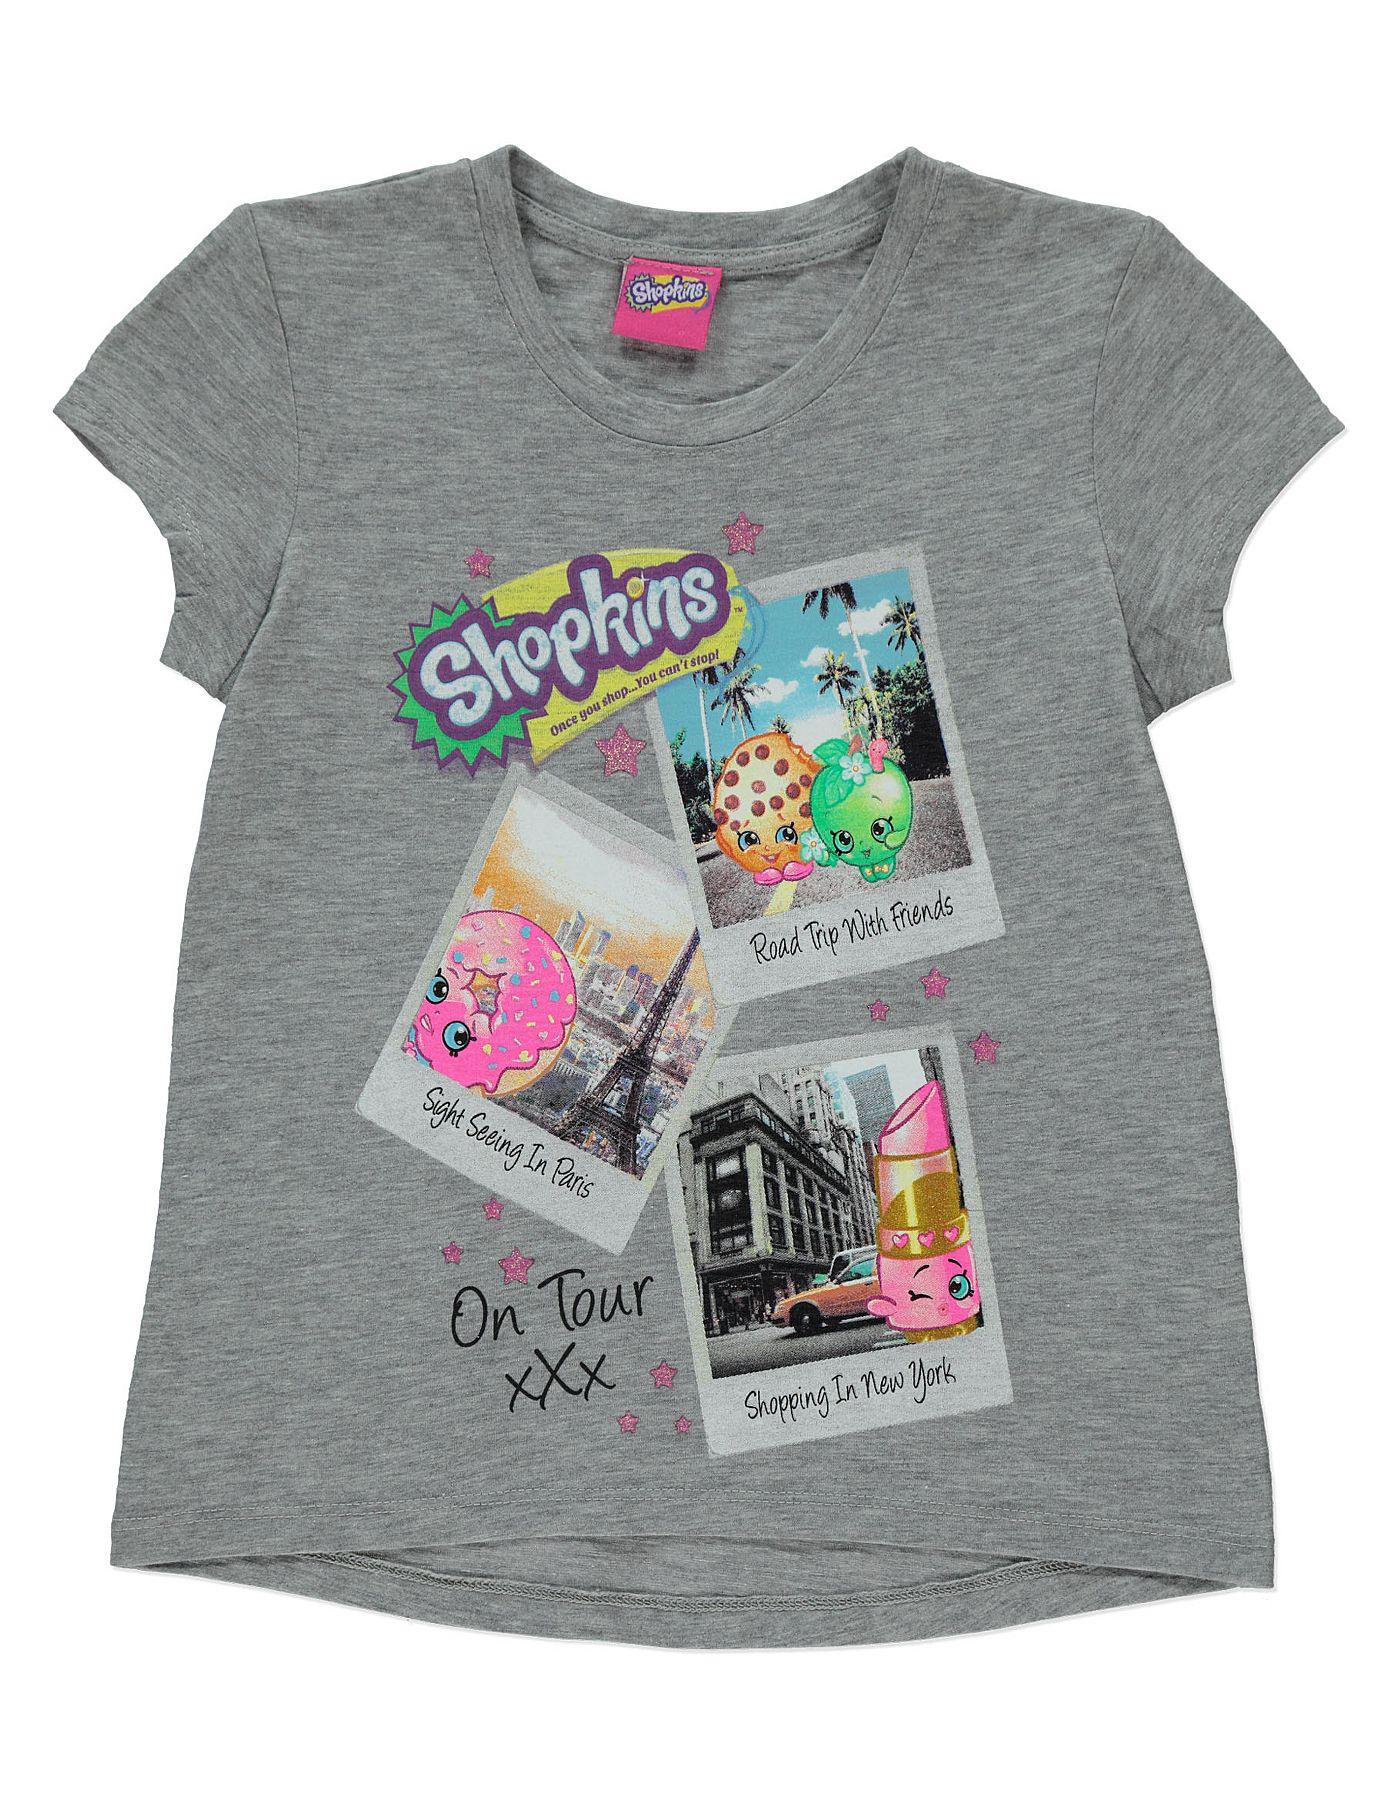 Black t shirt asda - Shopkins T Shirt